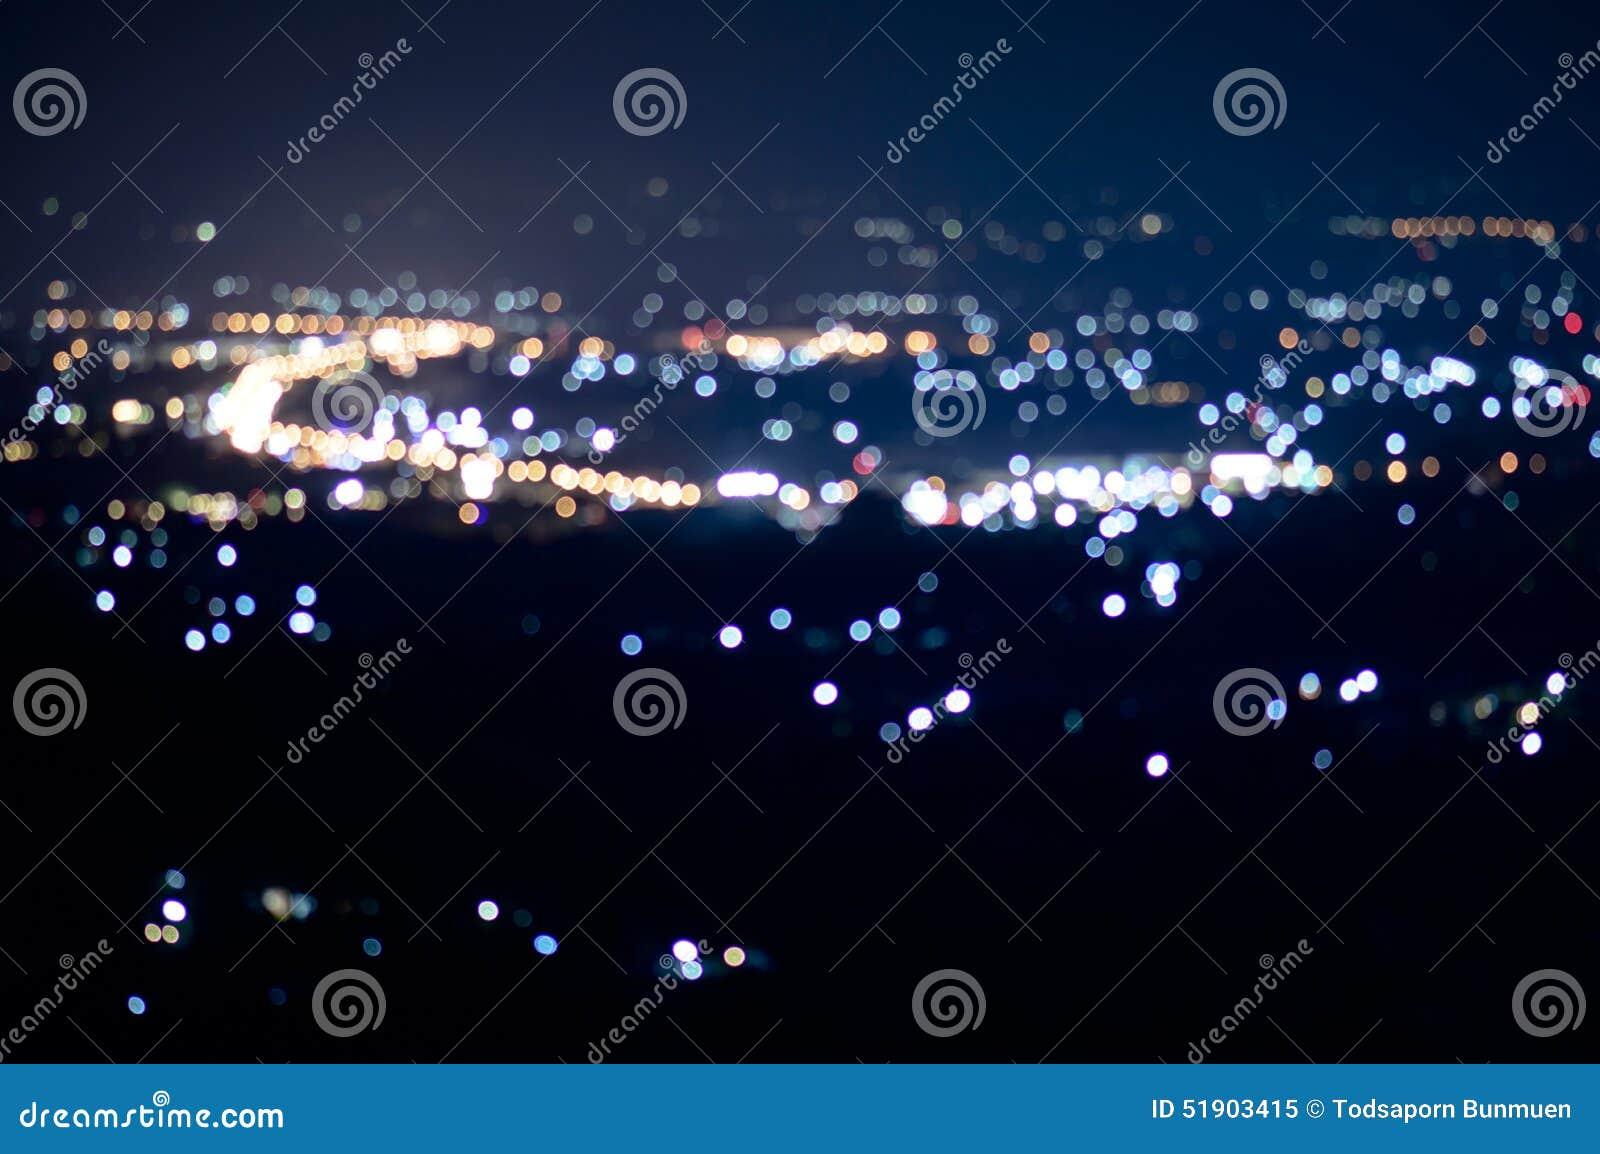 Defocused抽象ChiangMai市夜点燃背景